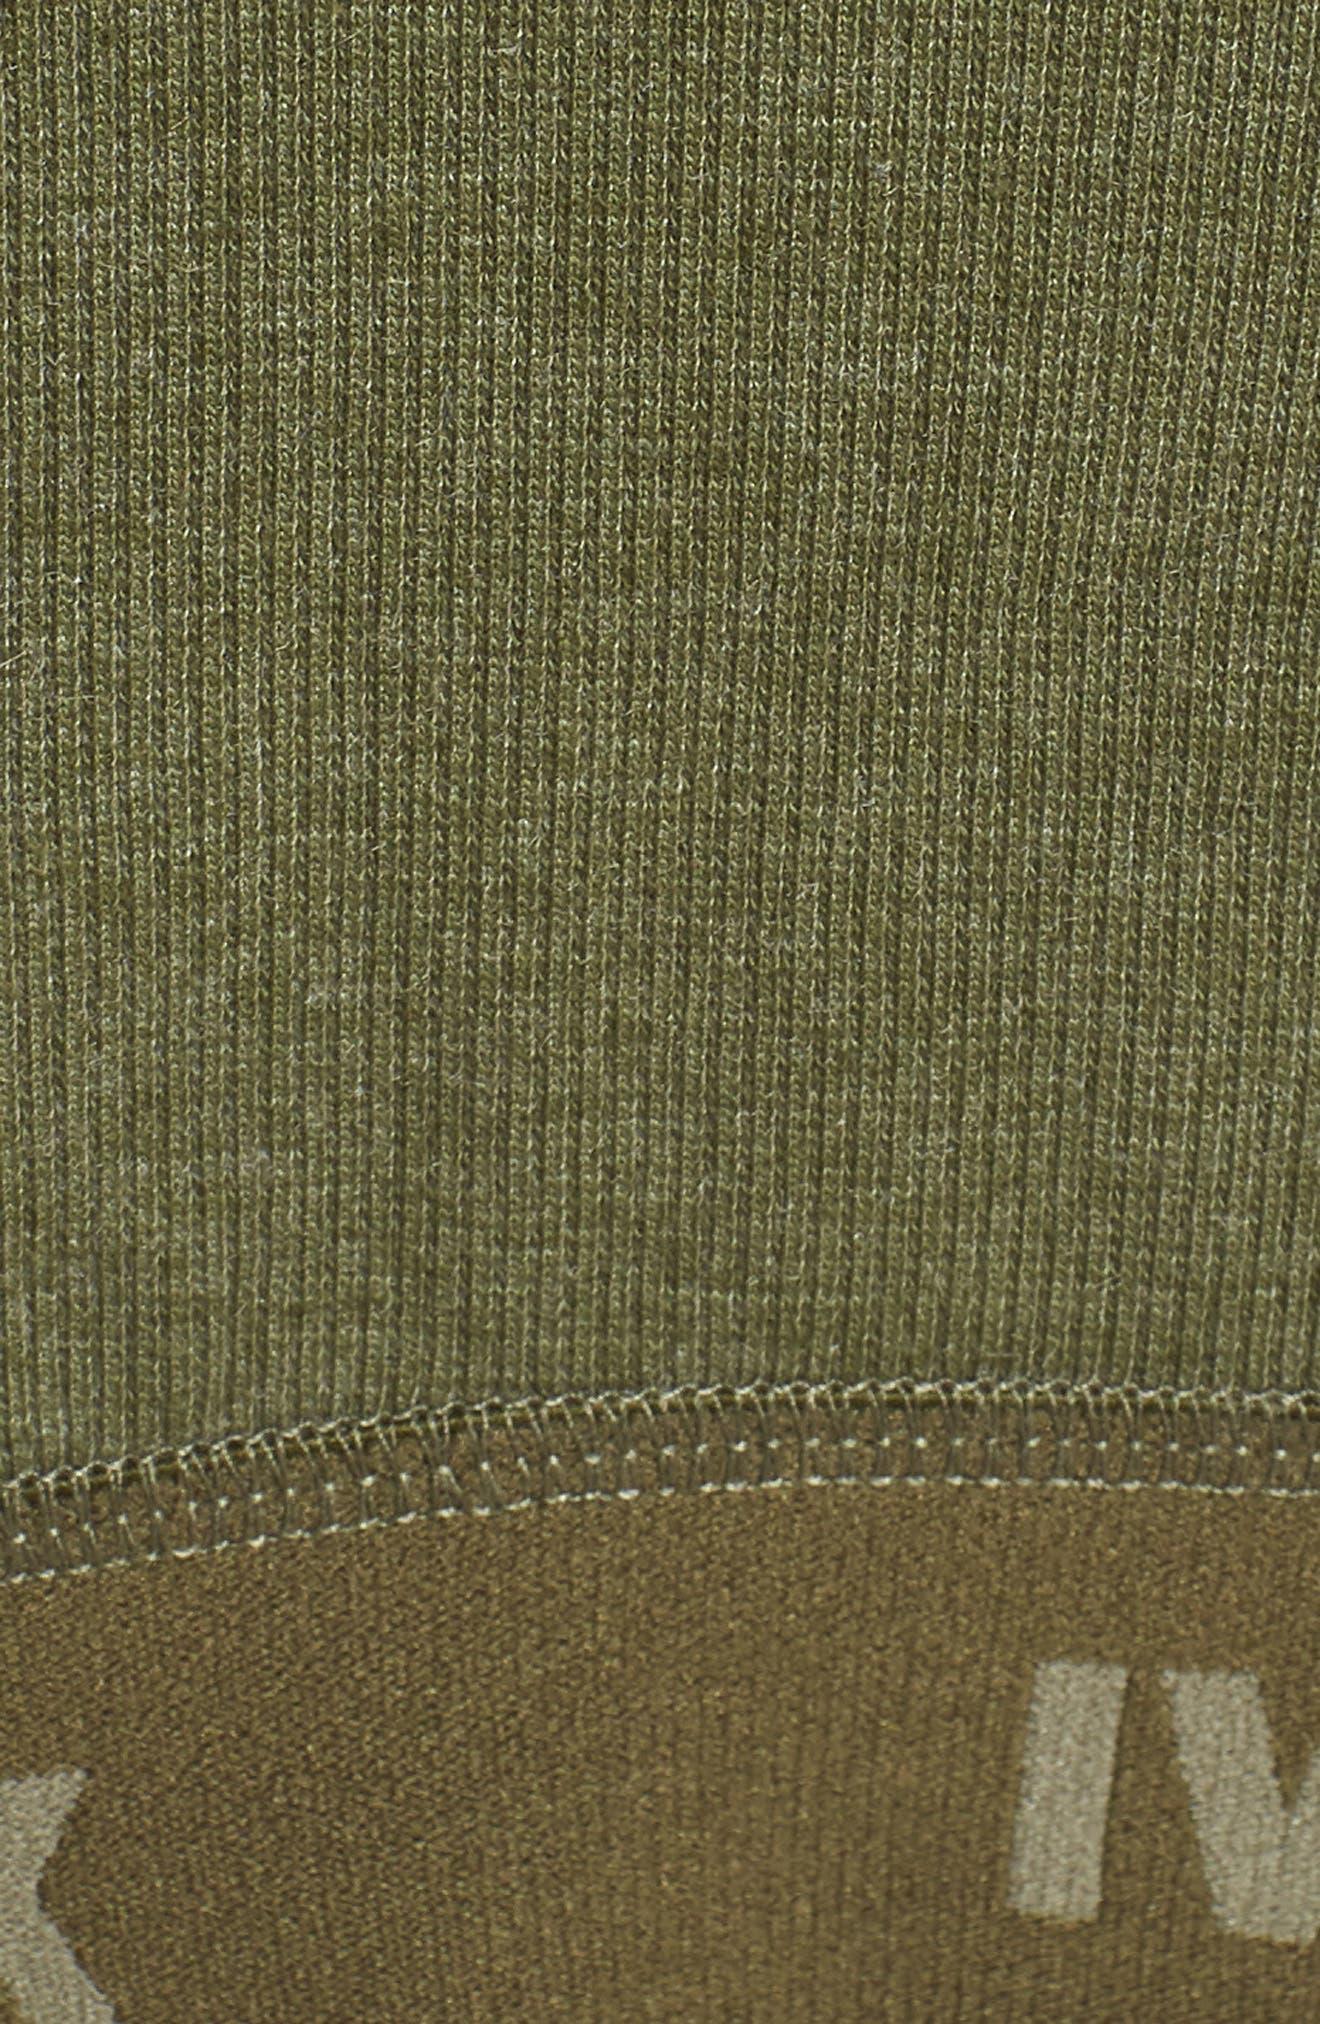 Plunge Crossover Rib Knit Sports Bra,                             Alternate thumbnail 6, color,                             Moss